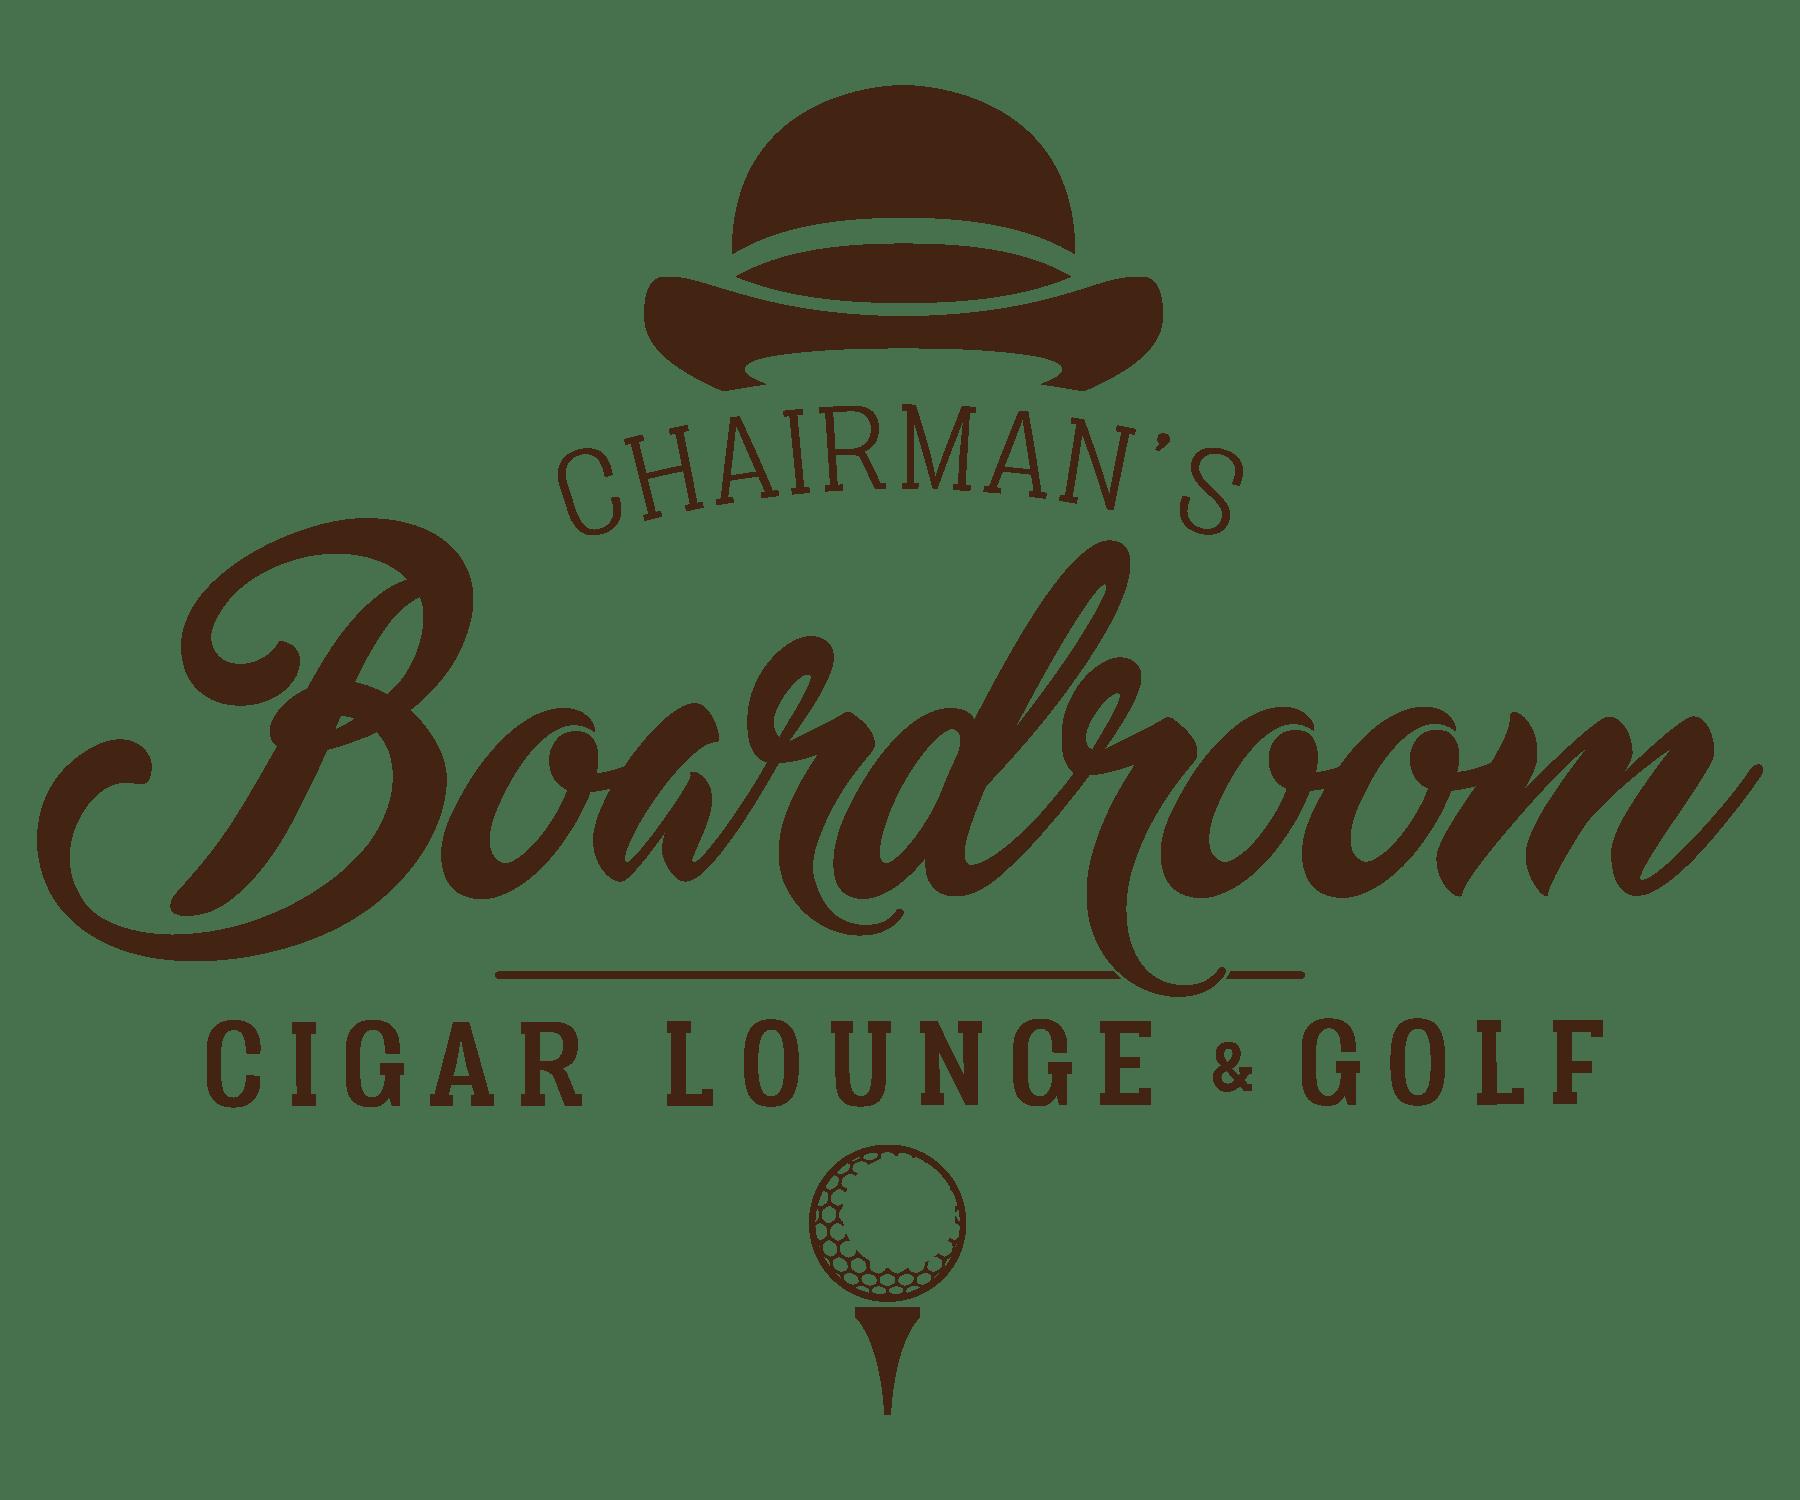 Chairman's Boardroom